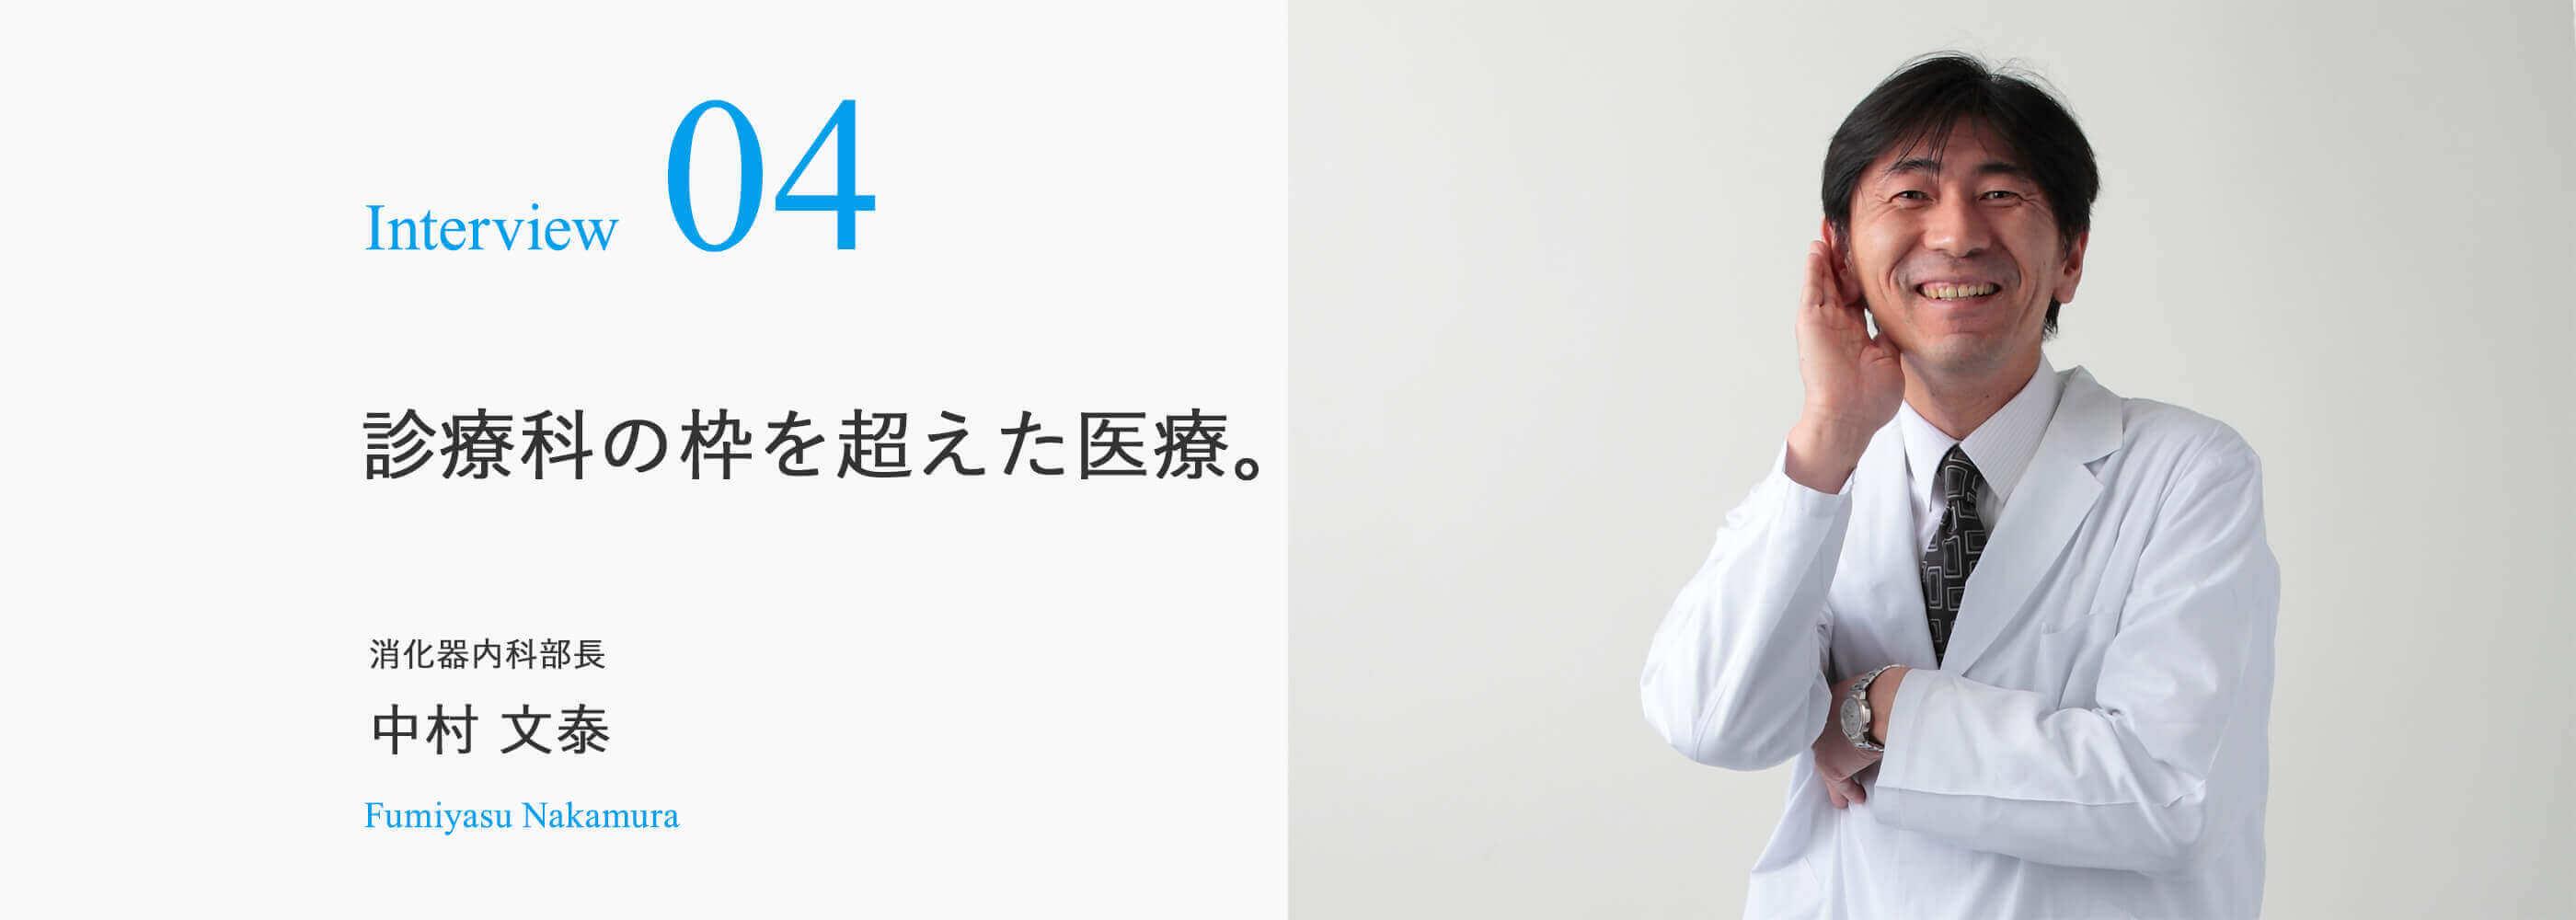 Interview 04 診療科の枠を超えた医療。消化器内科部長 中村 文泰